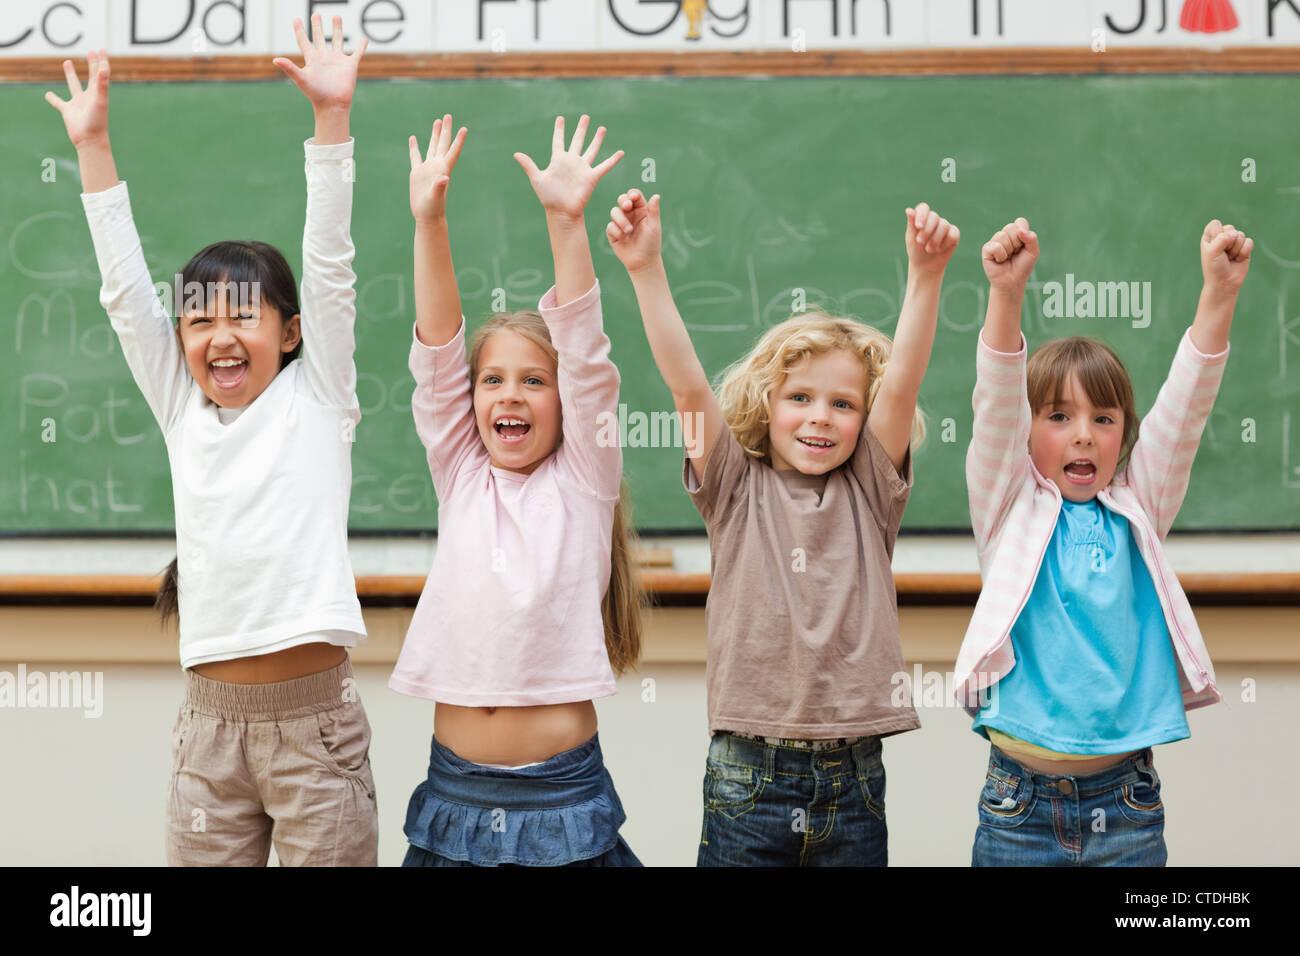 Students Celebrating School Stock Photos & Students Celebrating School Stock Images - Alamy